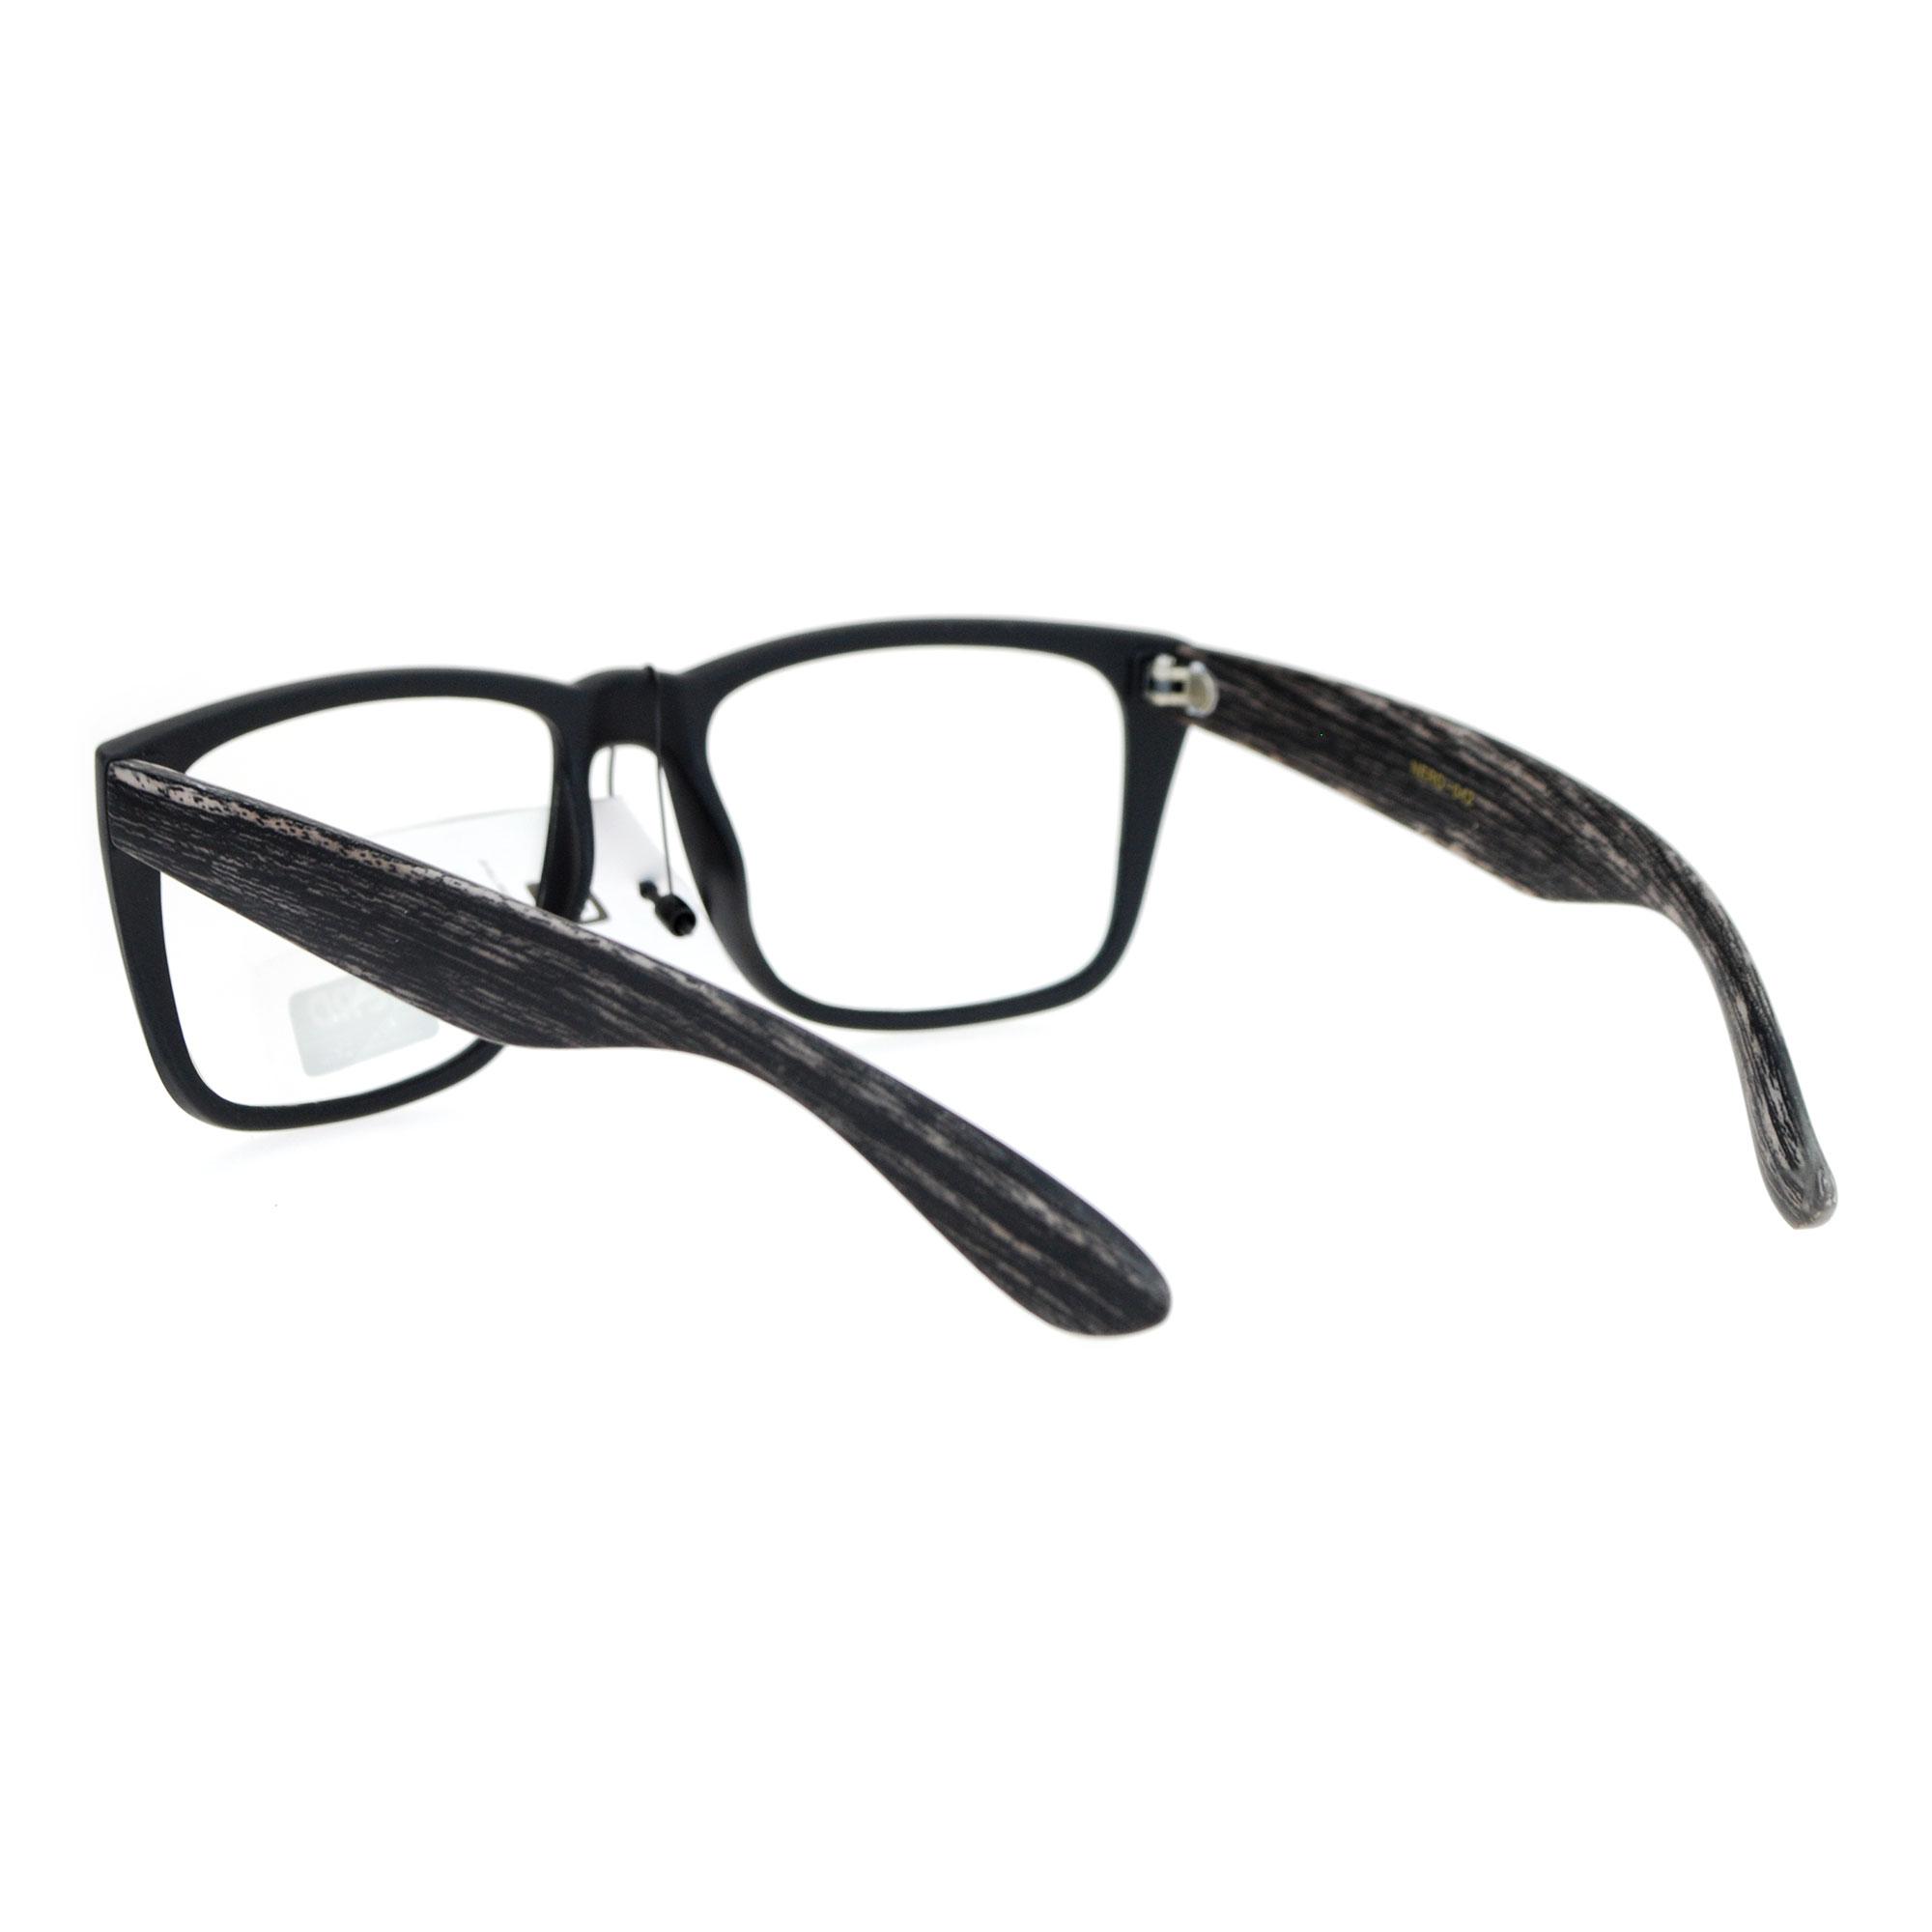 SA106 Wood Grain Arm Large Rectangular Clear Lens Eye ...